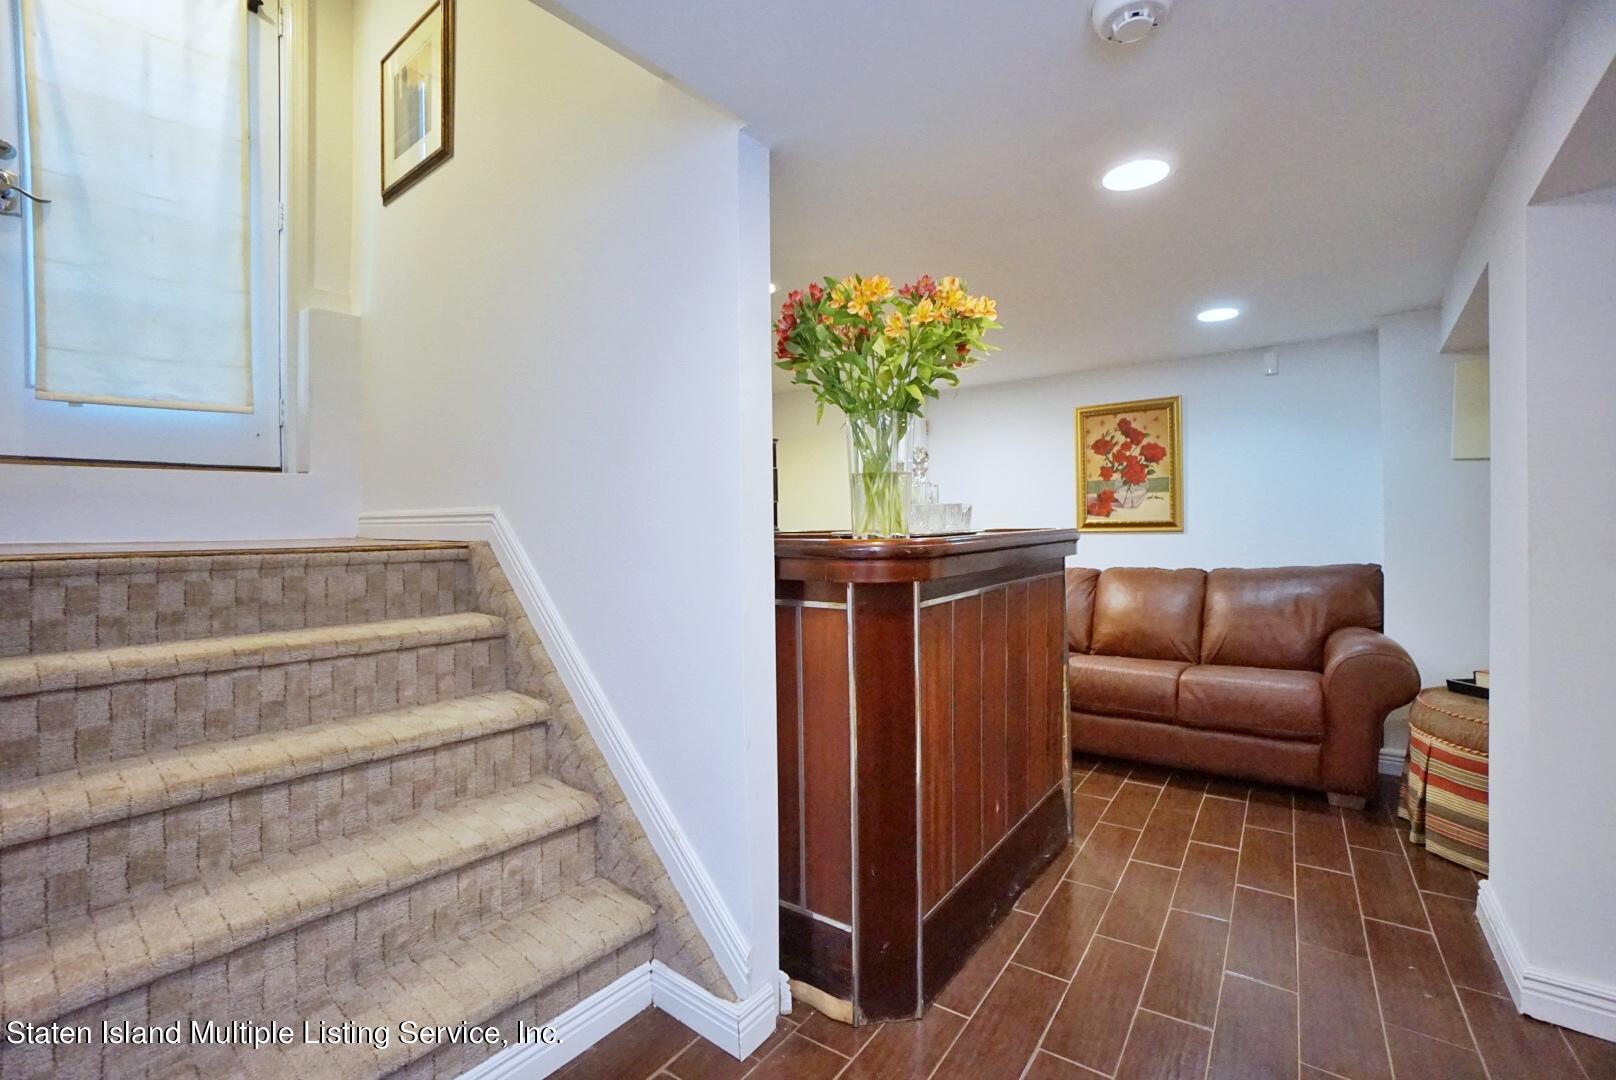 Single Family - Detached 311 Bement Avenue  Staten Island, NY 10310, MLS-1147133-33